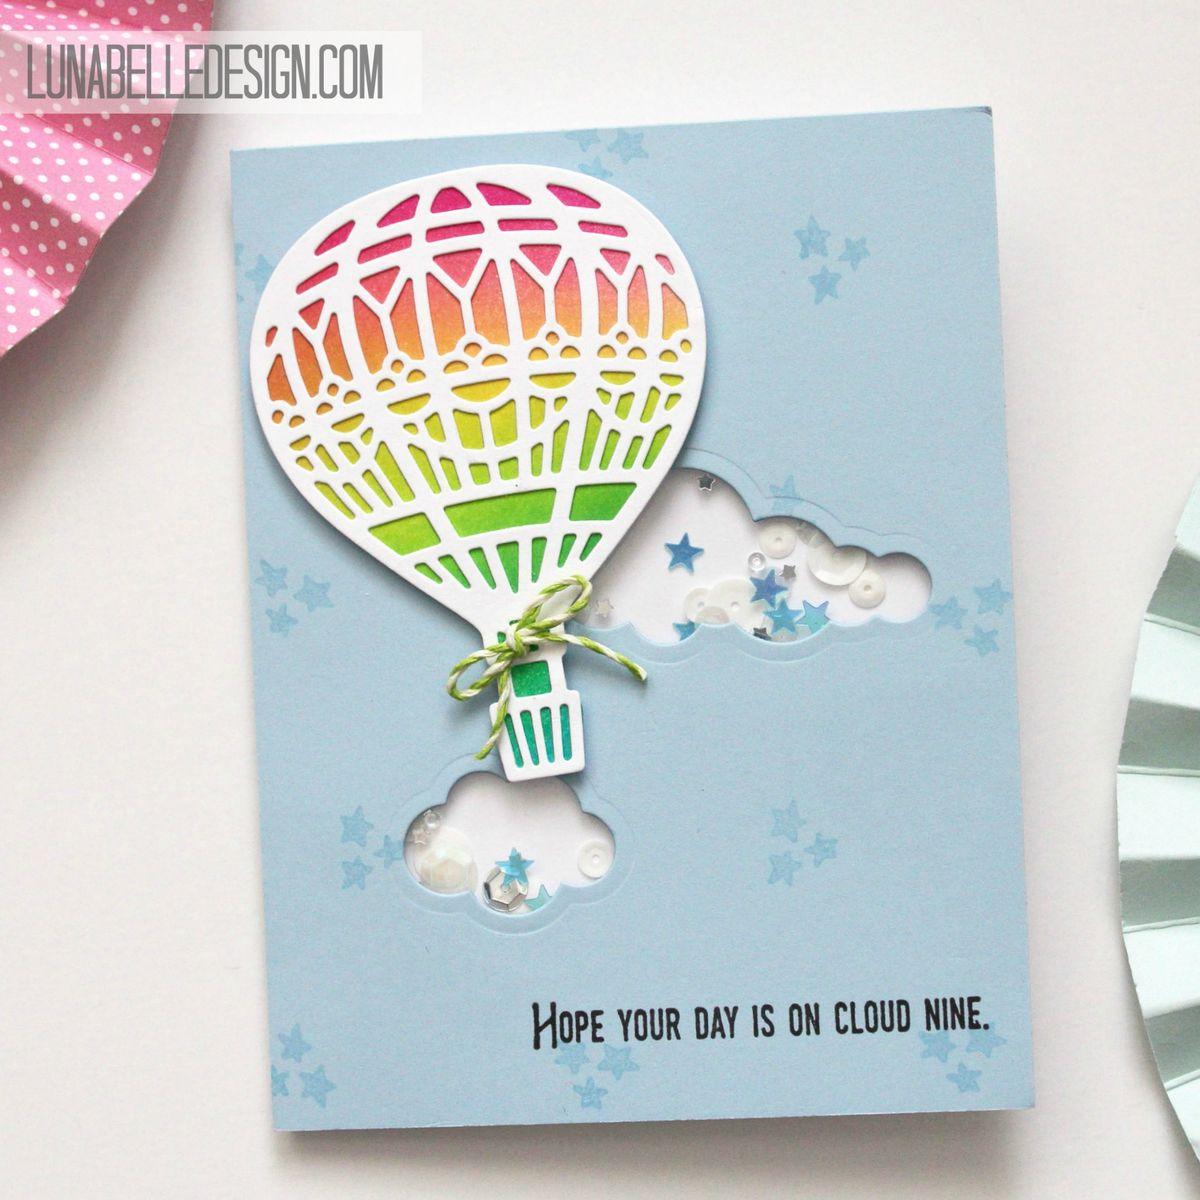 Luna belle design hotairballoonshakerbirthdayshaker card hot air balloon bookmarktalkfo Image collections